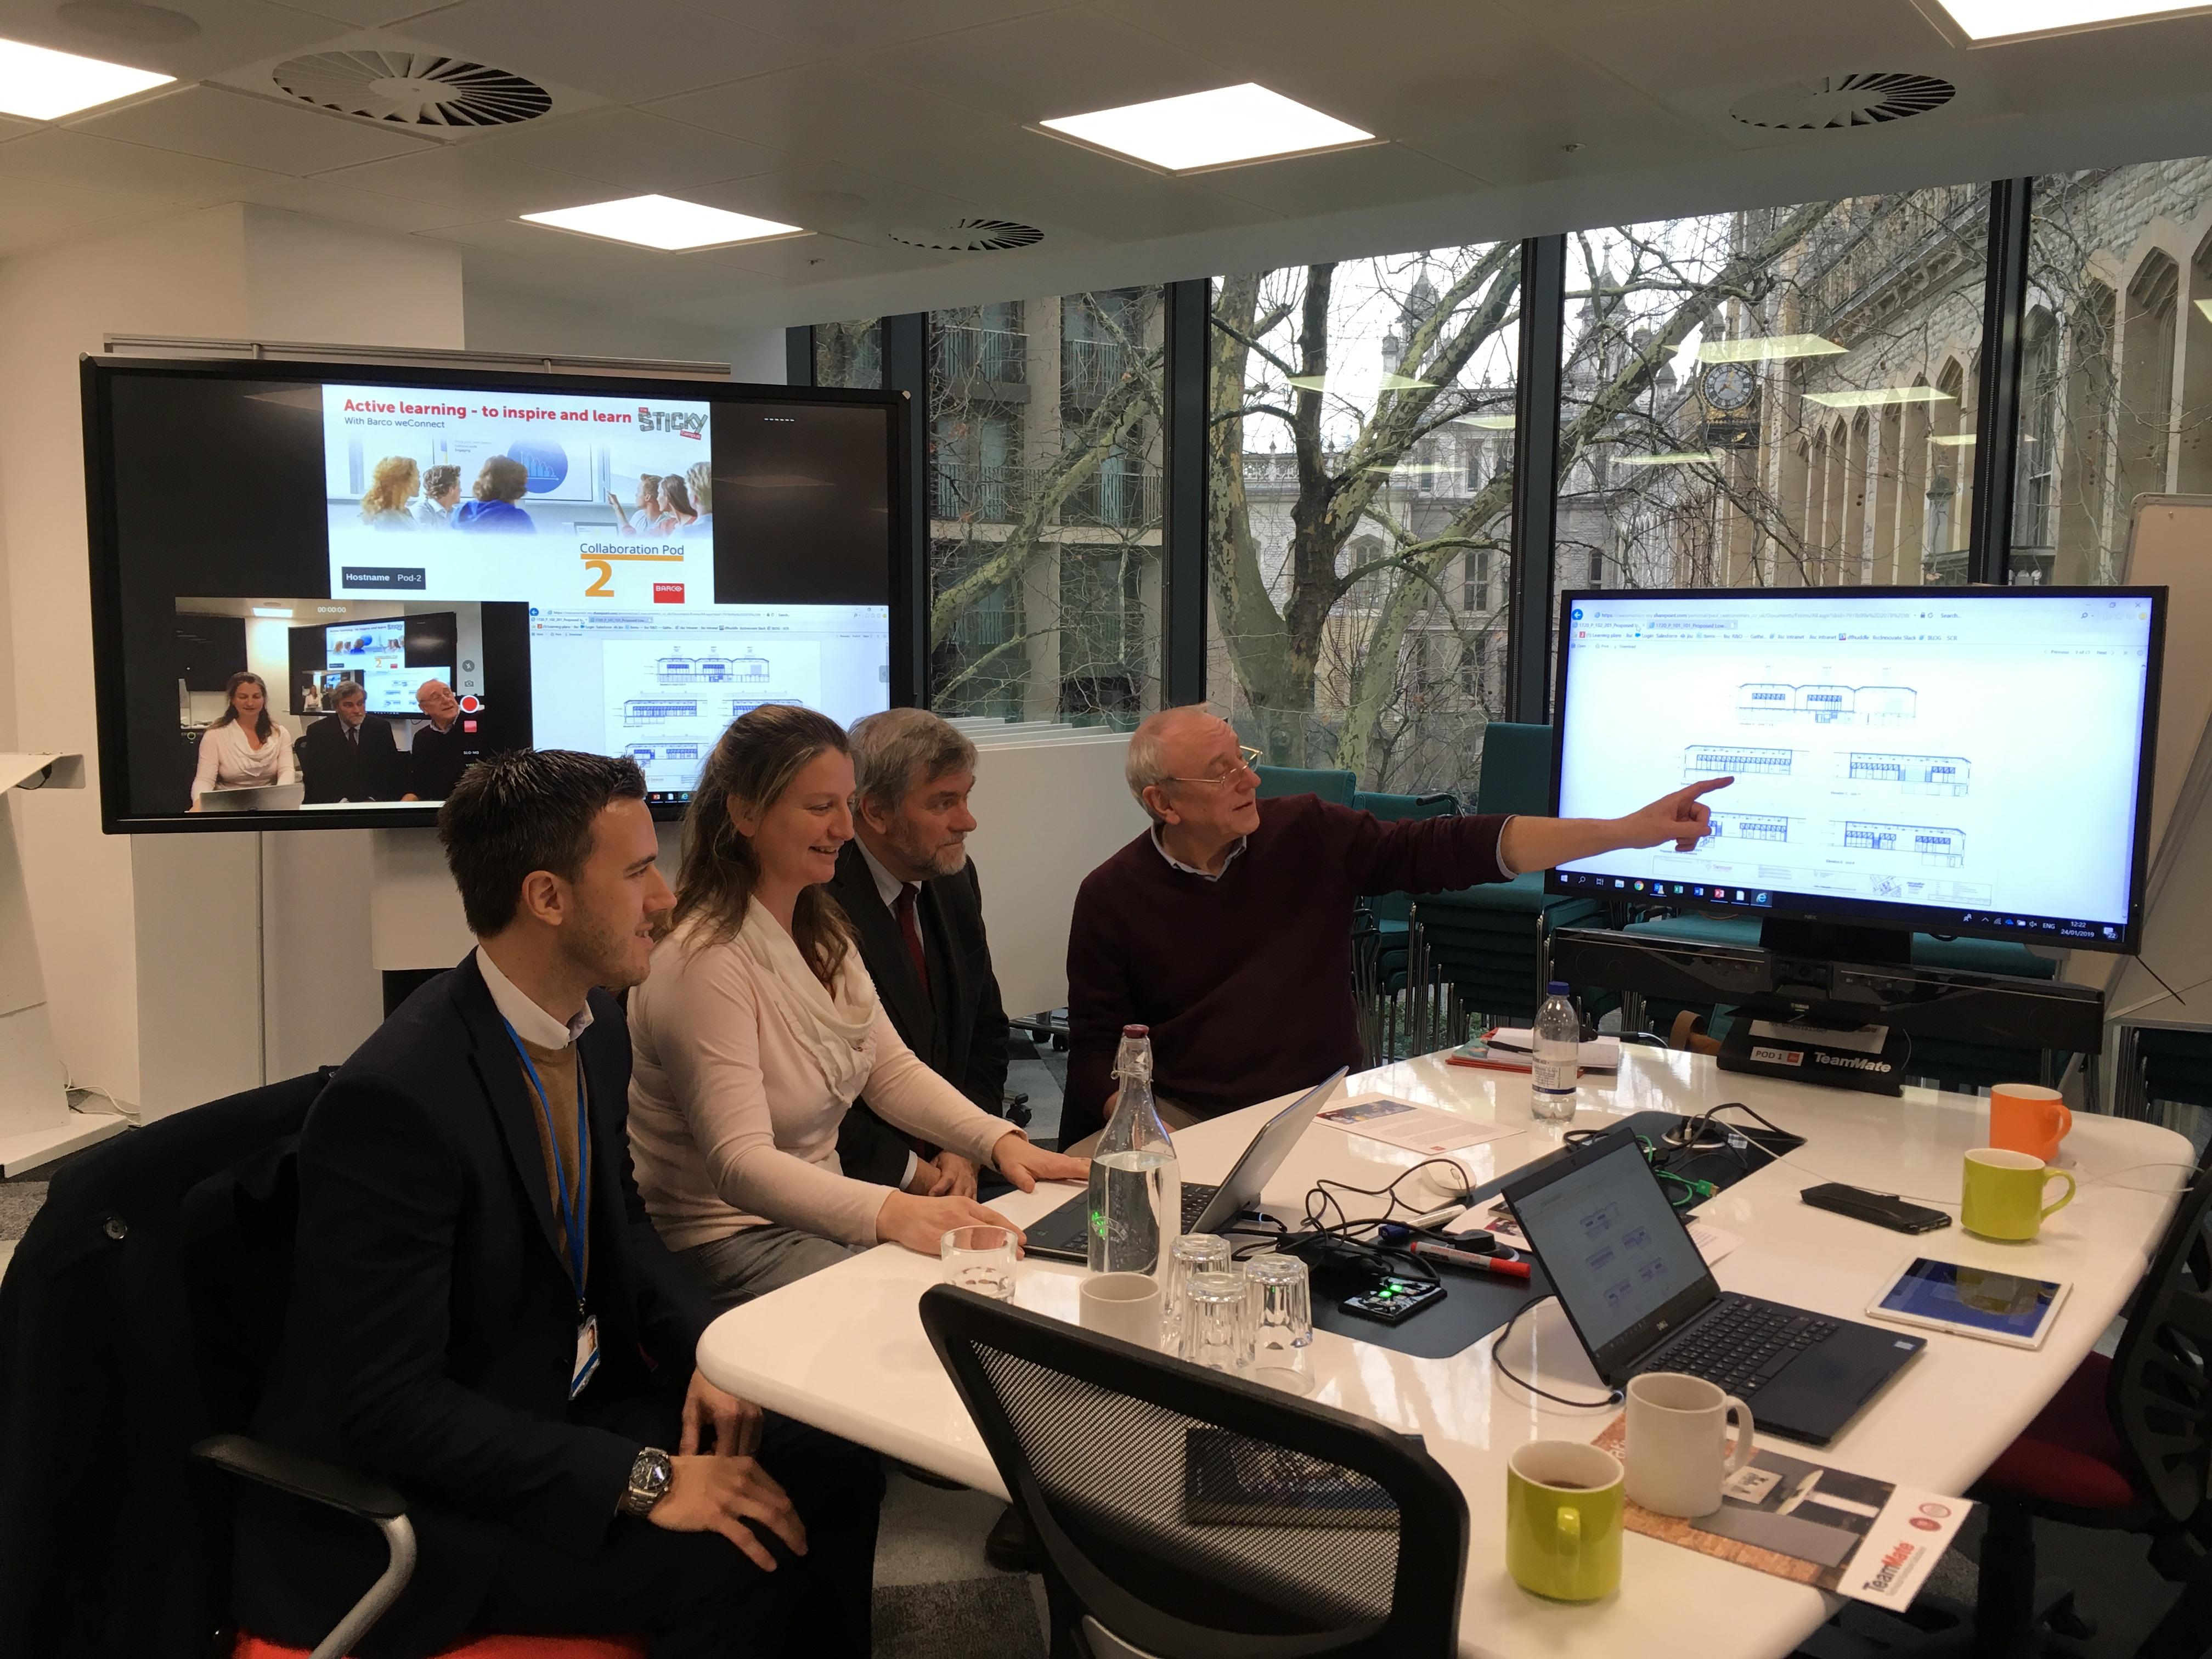 Carl Fry (Jisc), Rachael Foy, Geraint Coles and Alun Dawes (RAU) try out the new digital classroom (Photo courtesy of Anne Stevenson)